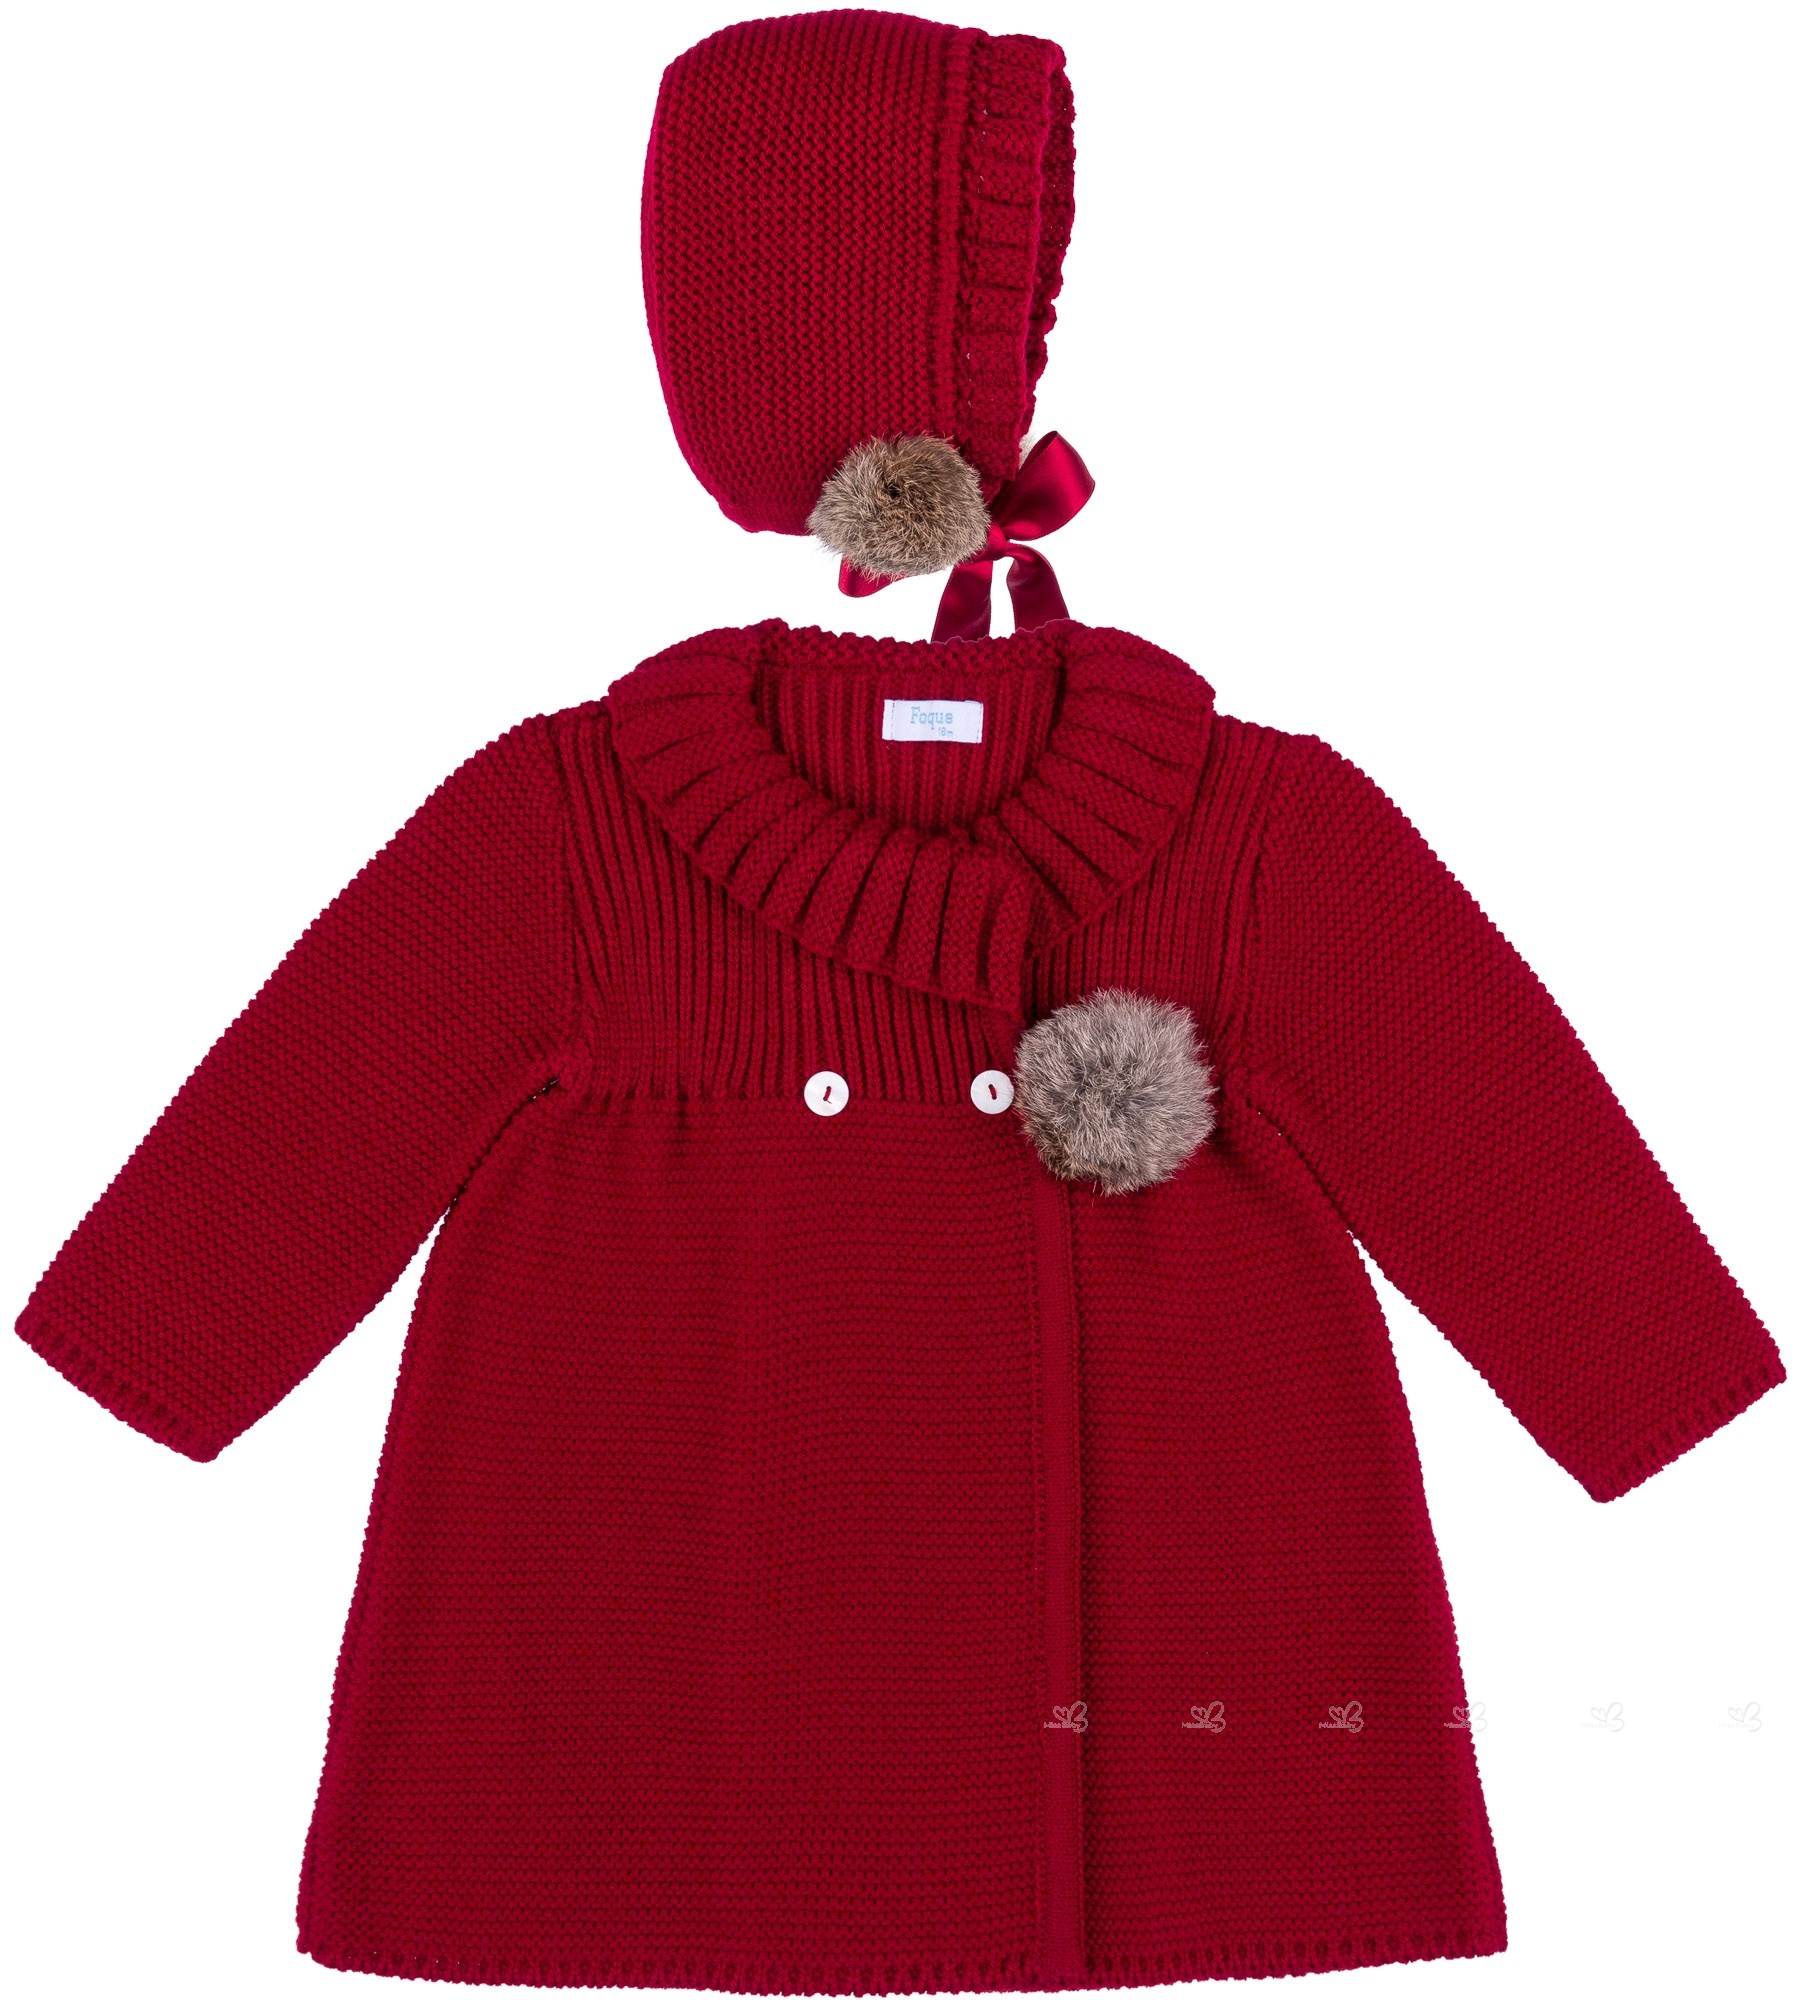 1f0b374cbd30 Foque Baby Girls Burgundy Pram Coat   Bonnet Set